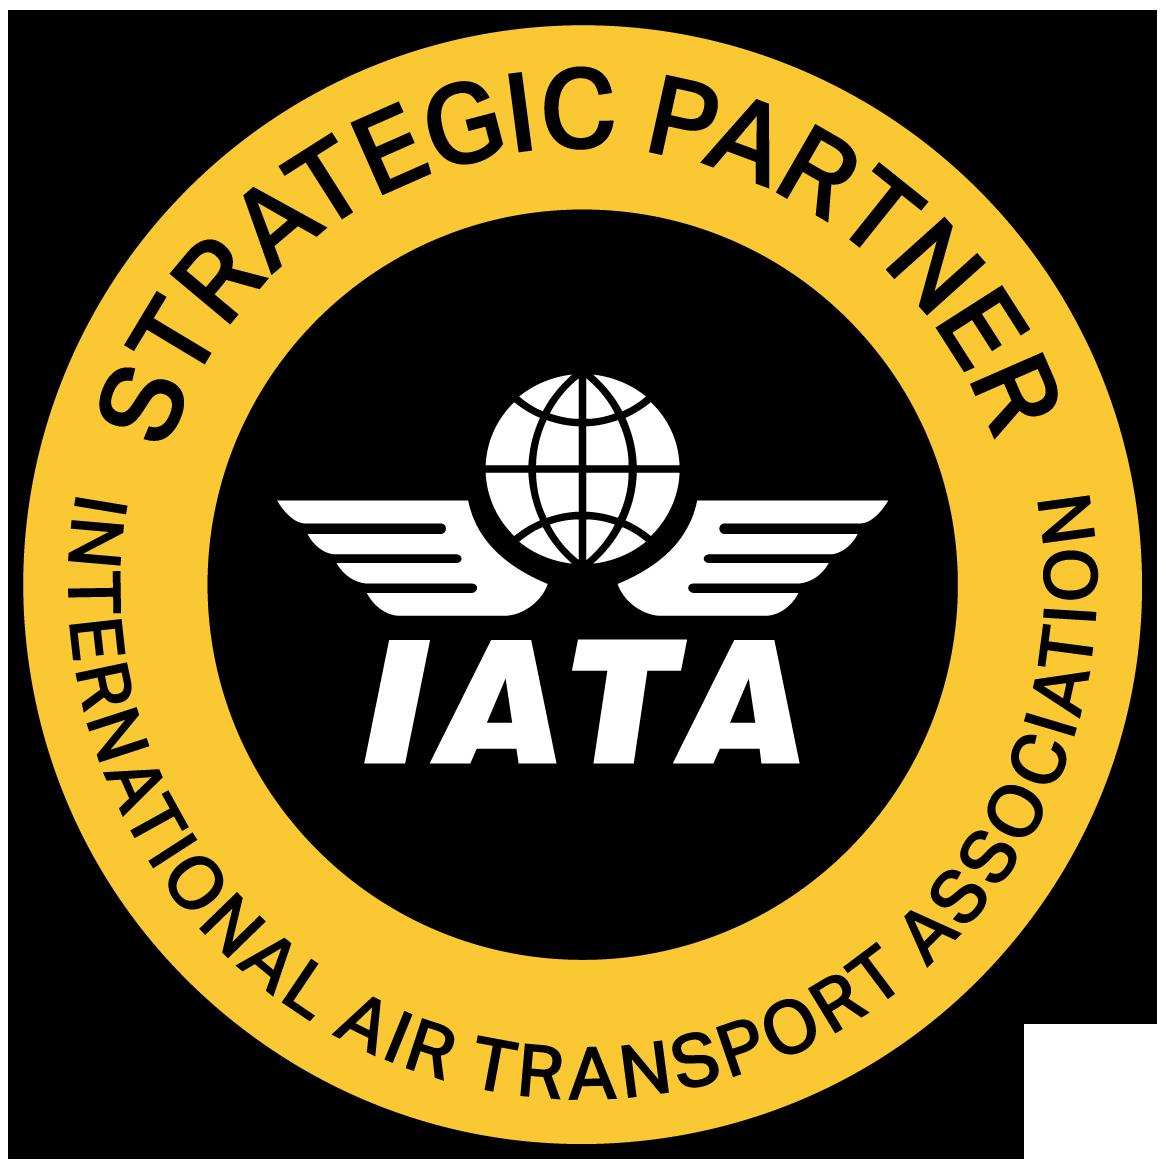 IATA Strategic Partner stamp